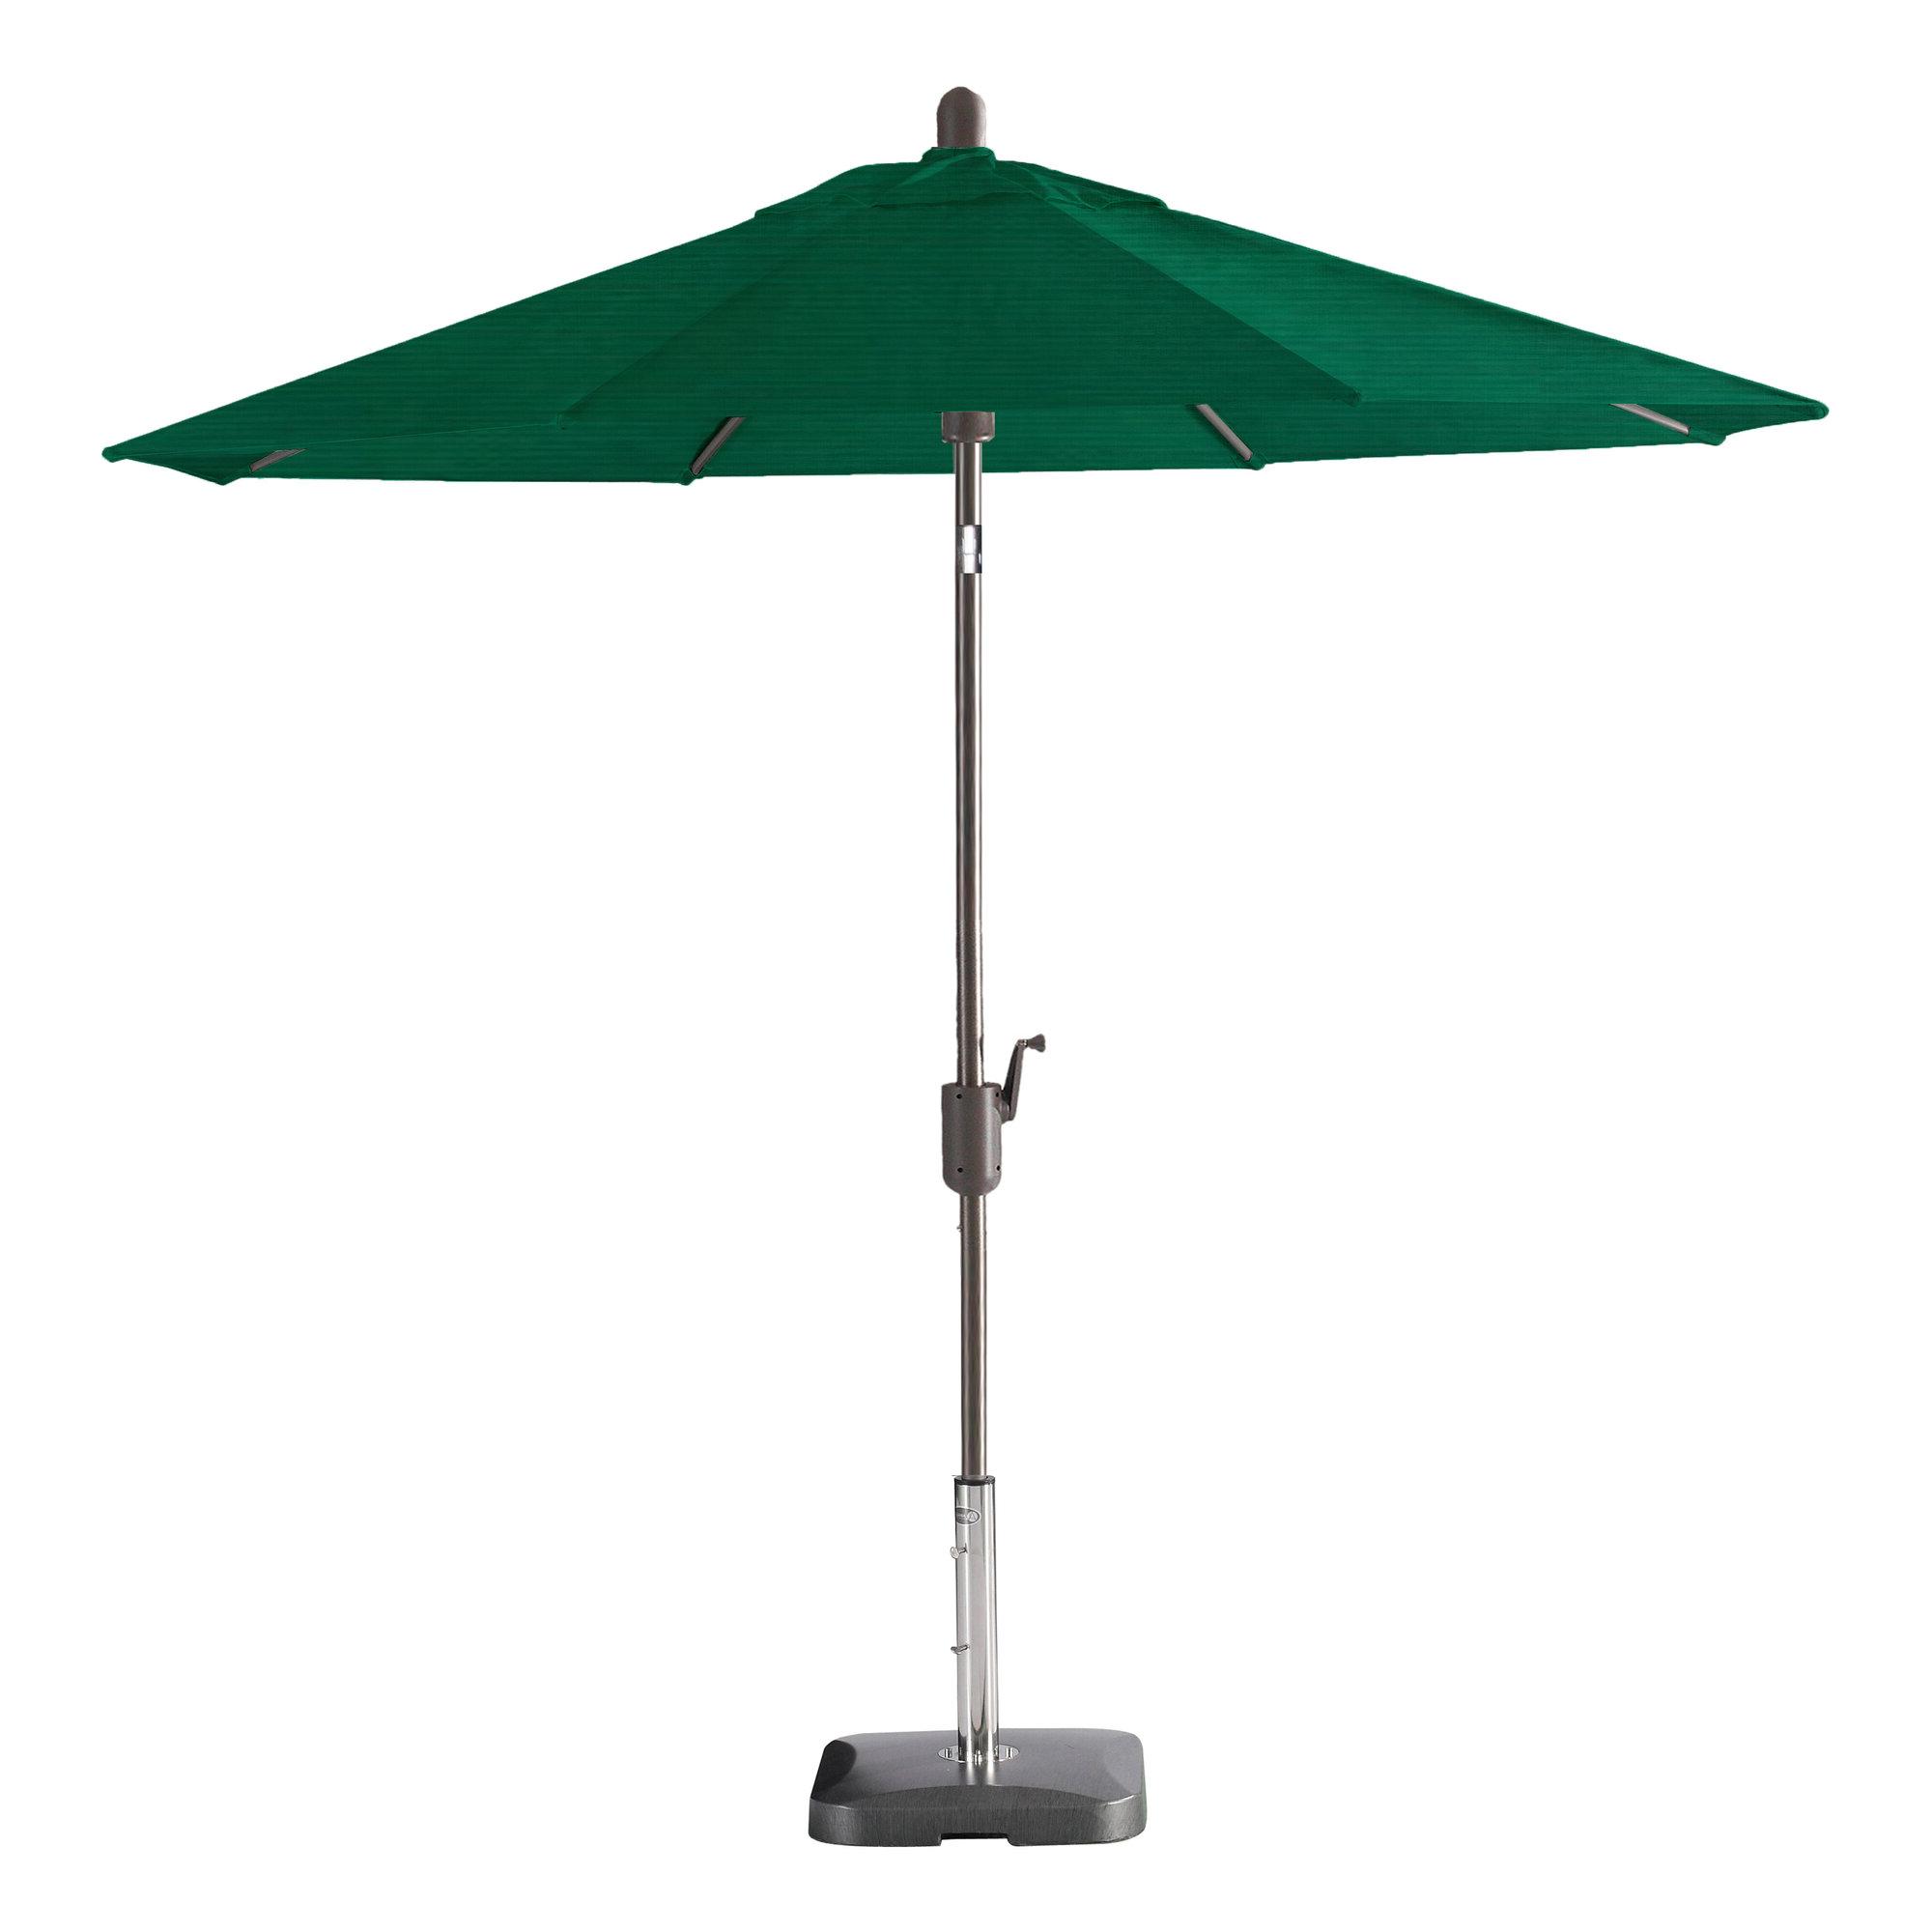 Details About Breakwater Bay Wiechmann 9' Market Sunbrella Umbrella Regarding Famous Wiechmann Market Sunbrella Umbrellas (View 3 of 20)